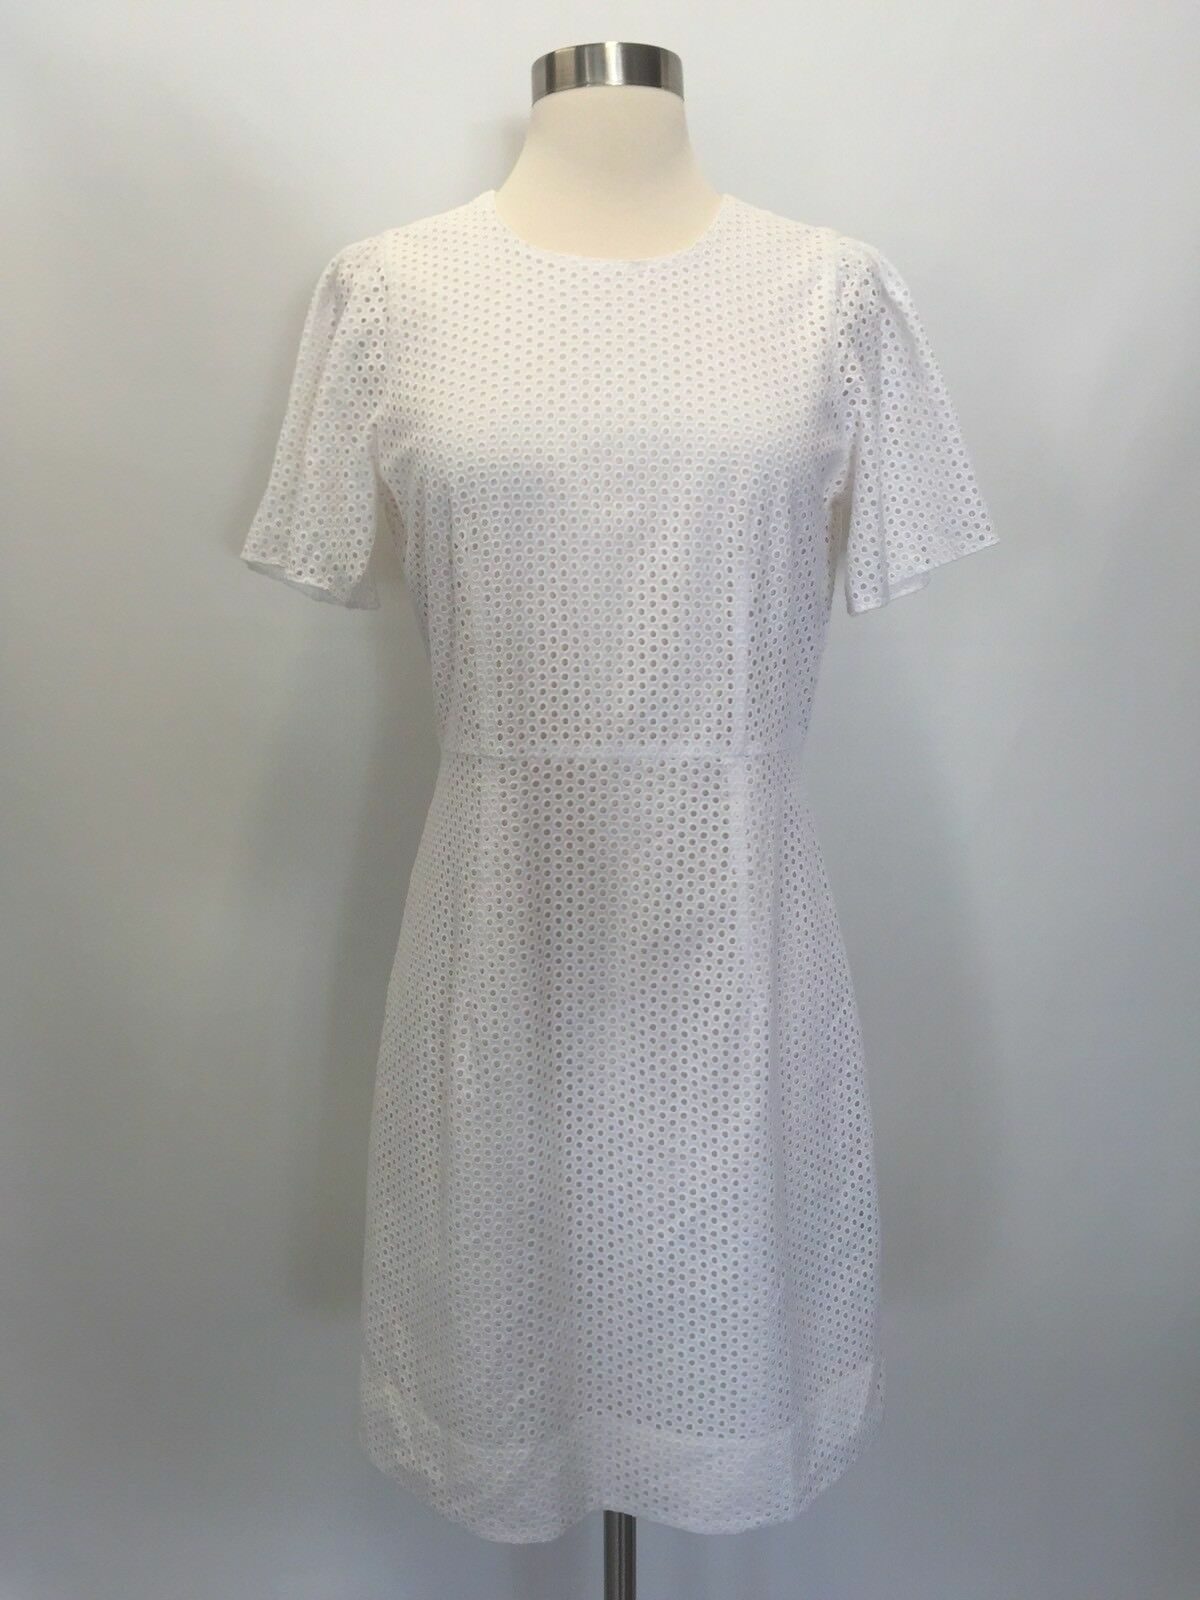 Jcrew  138 138 138 Flutter Sleeve Dress in Eyelet Sz 2 Ivory F1724 NEW 6ca04e